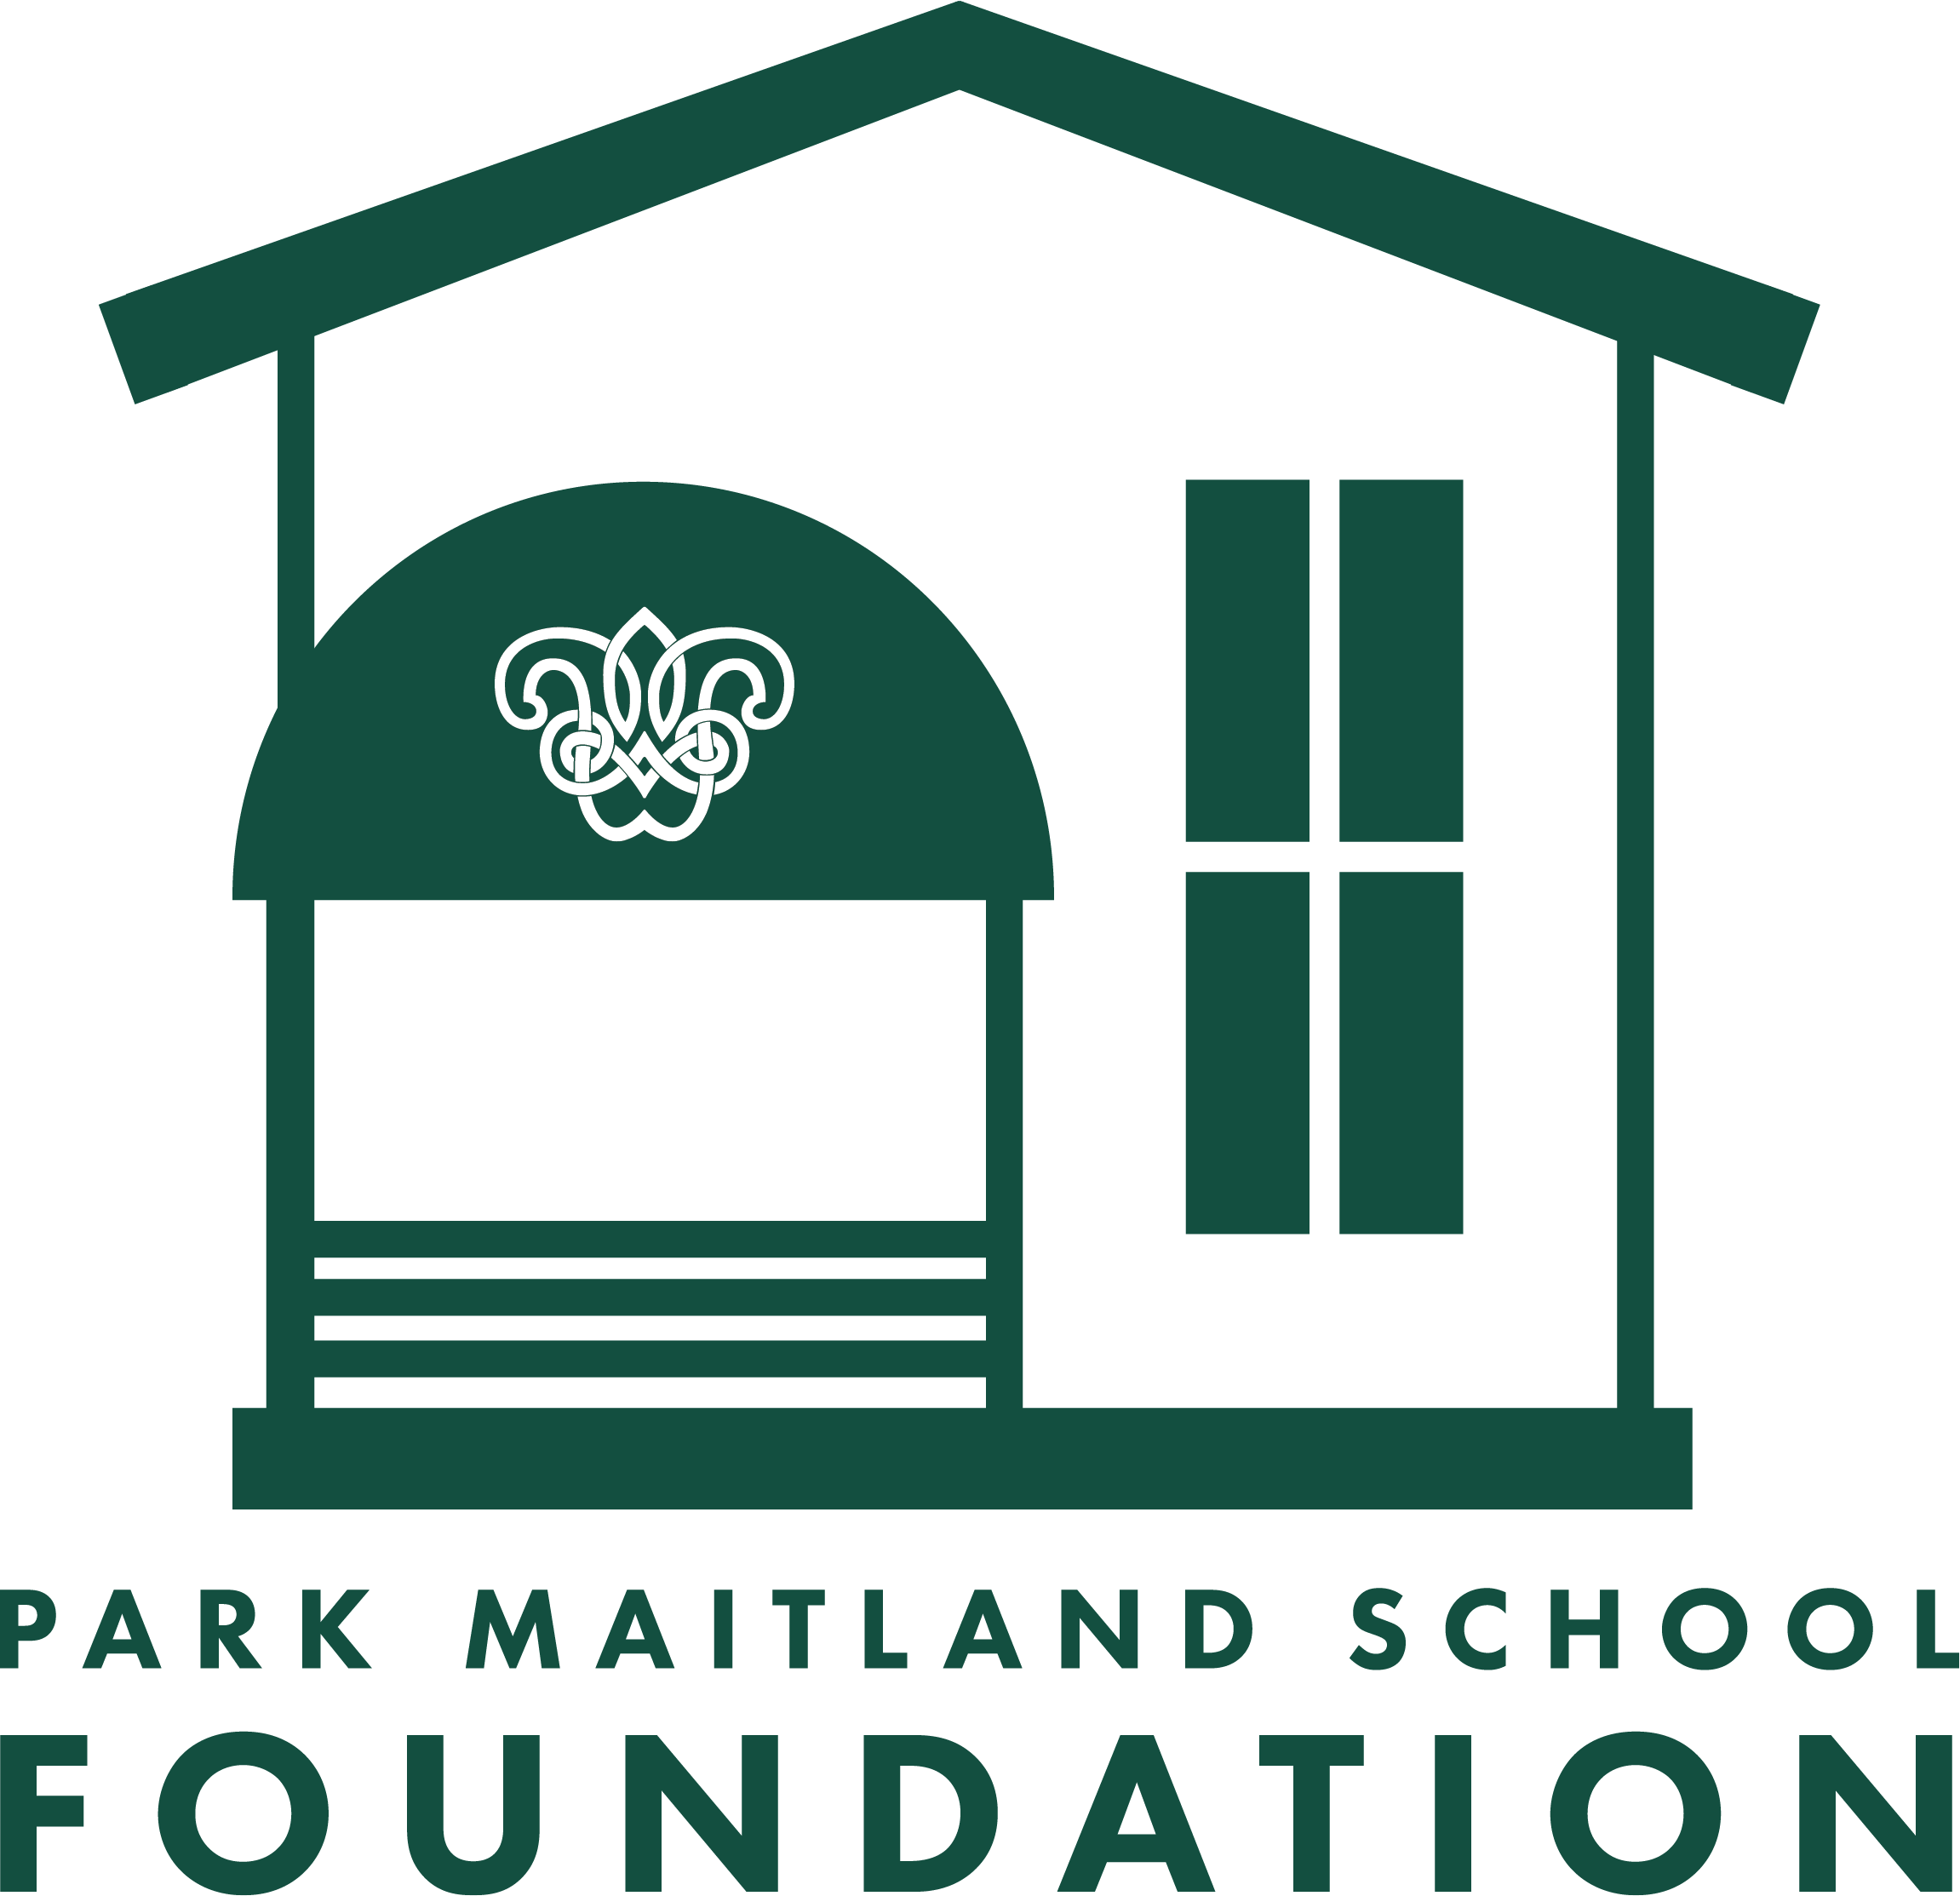 Park Maitland School Foundation